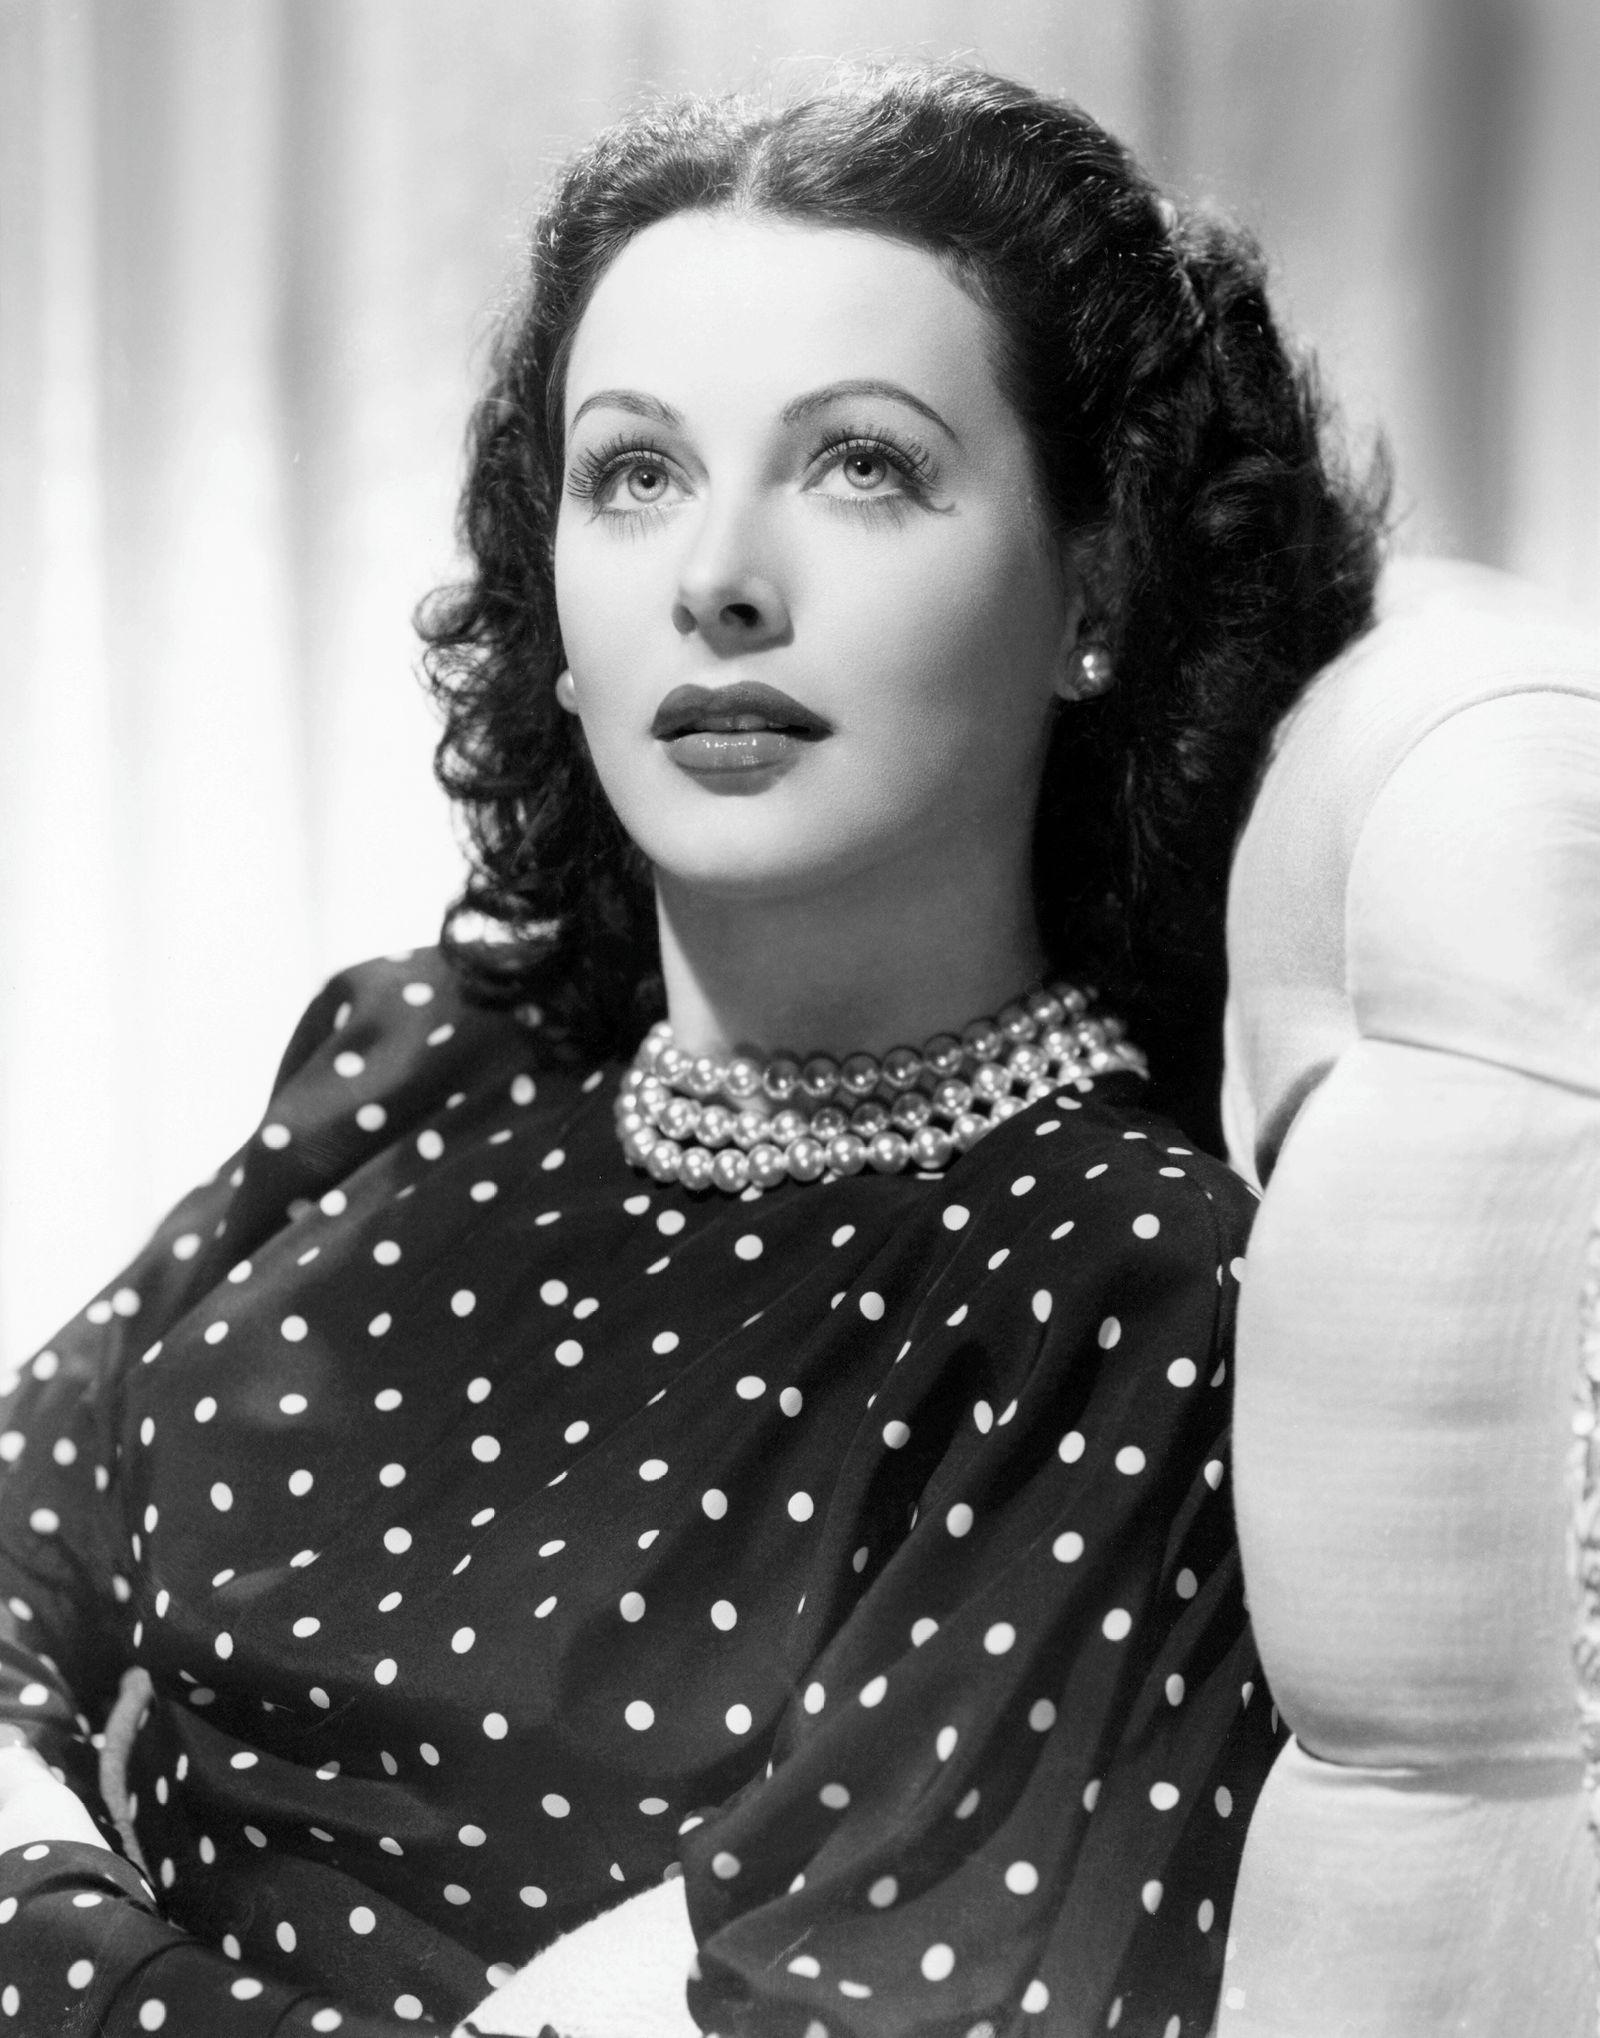 COMRADE X, Hedy Lamarr, 1940 Courtesy Everett Collection PUBLICATIONxINxGERxSUIxAUTxONLY Copyright: xCourtesyxEverettxCo